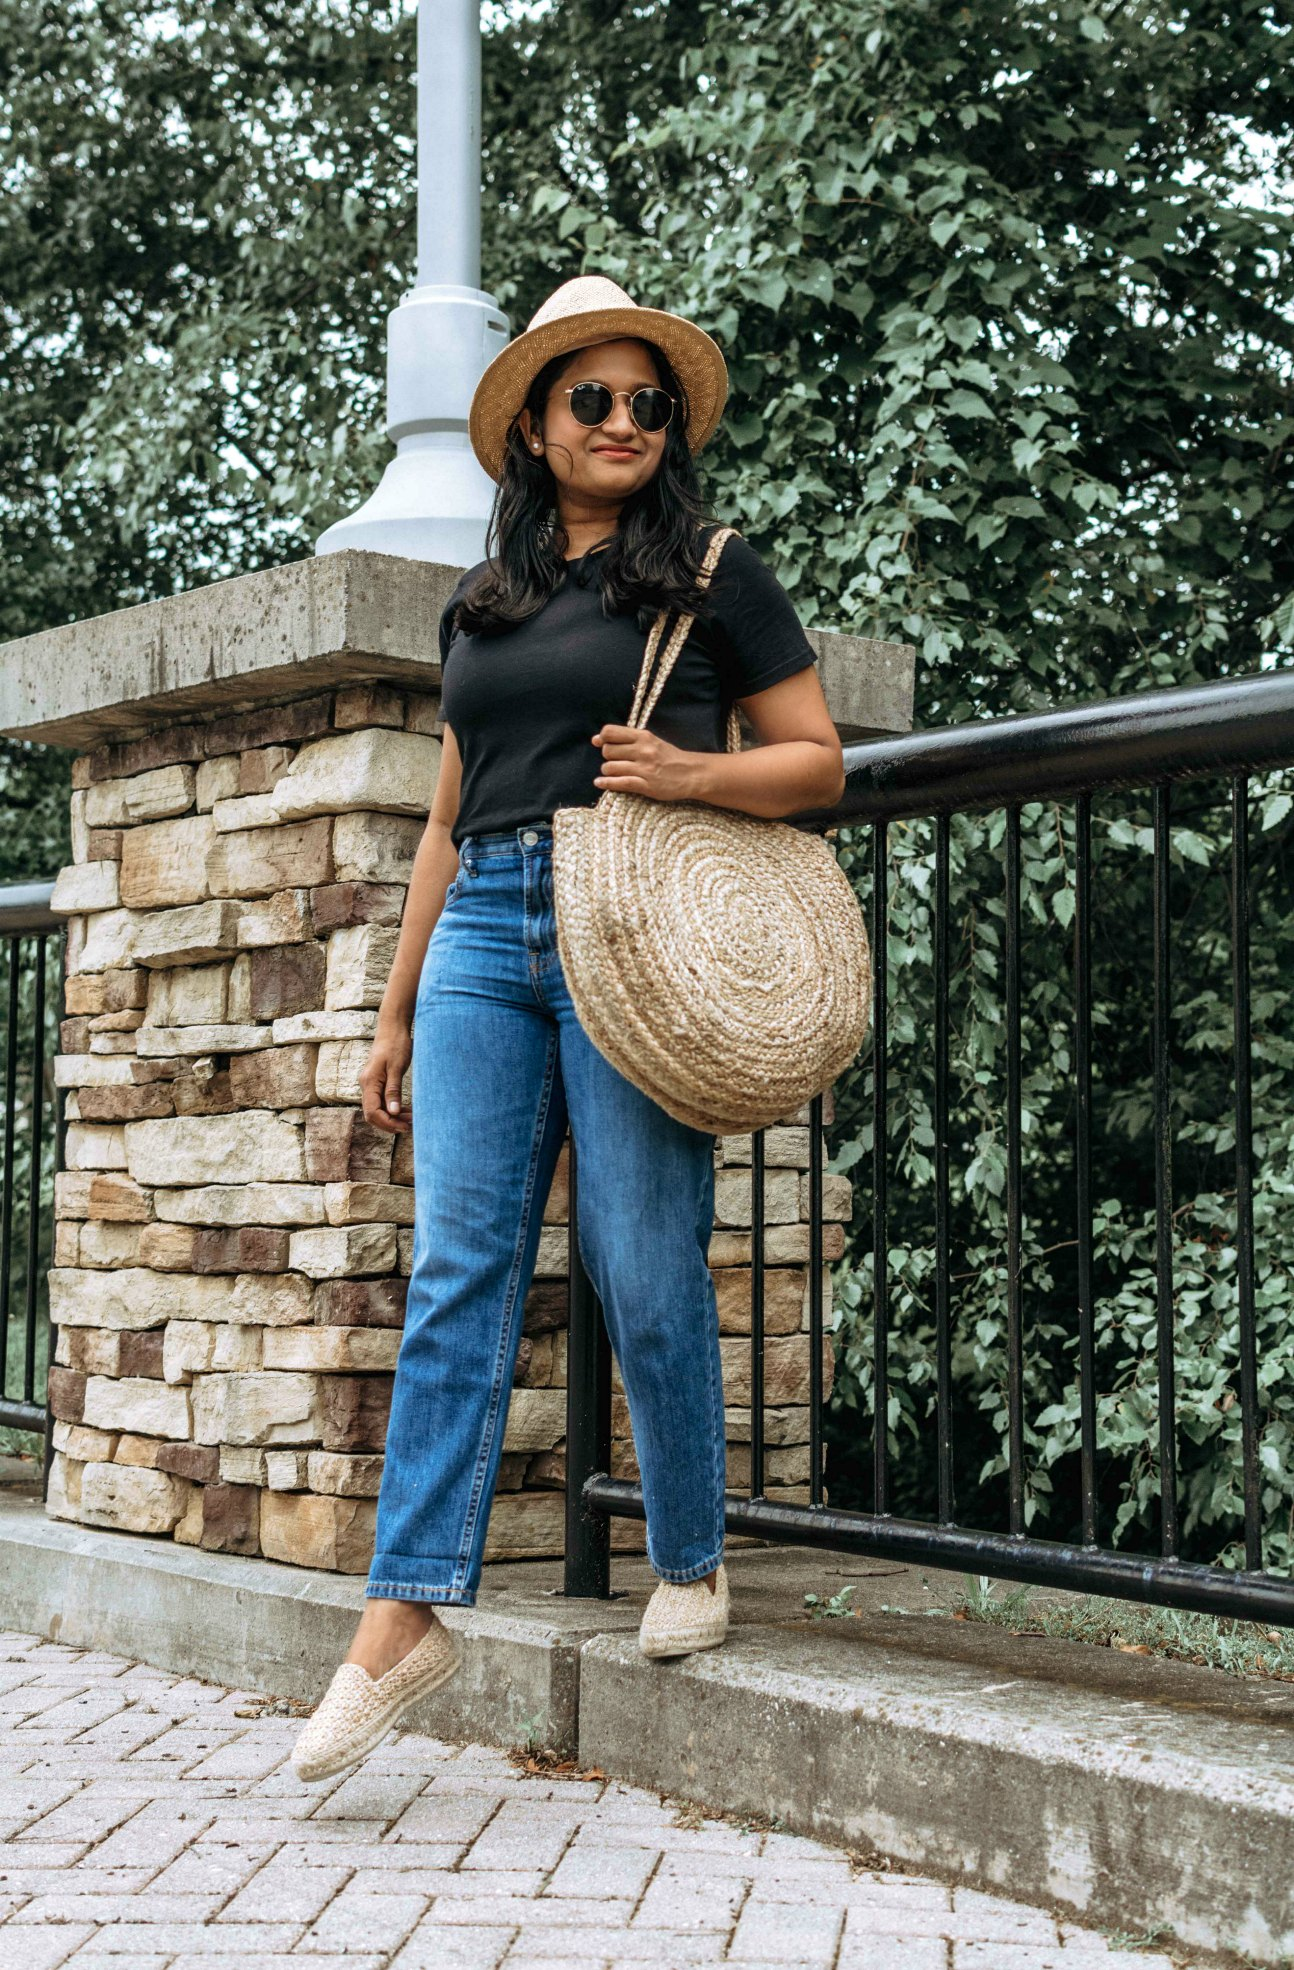 Wearing Everlane summer jeans, Cotton Box-Cut Tee, Manebí Yucatan Raffia Espadrilles, Straw circle bag and straw hat